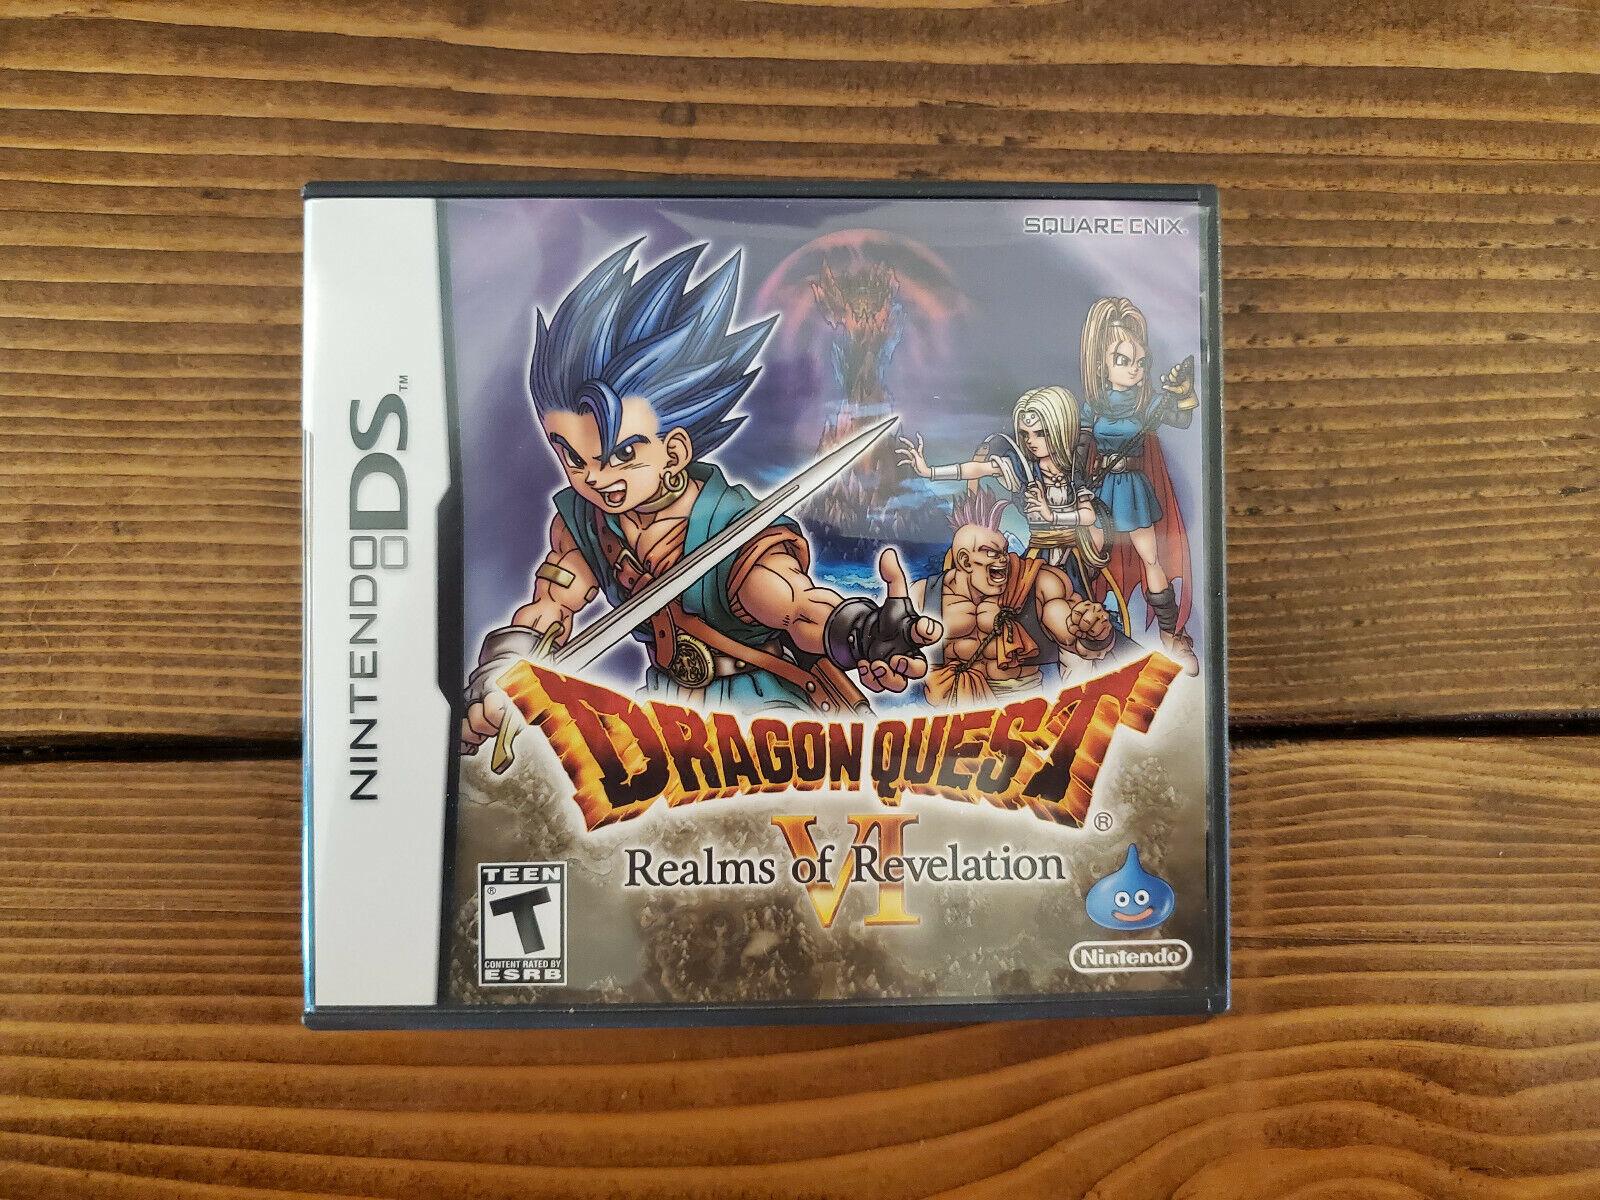 Dragon Quest VI 6 Realms Of Revelation Nintendo DS - Complete - $174.99